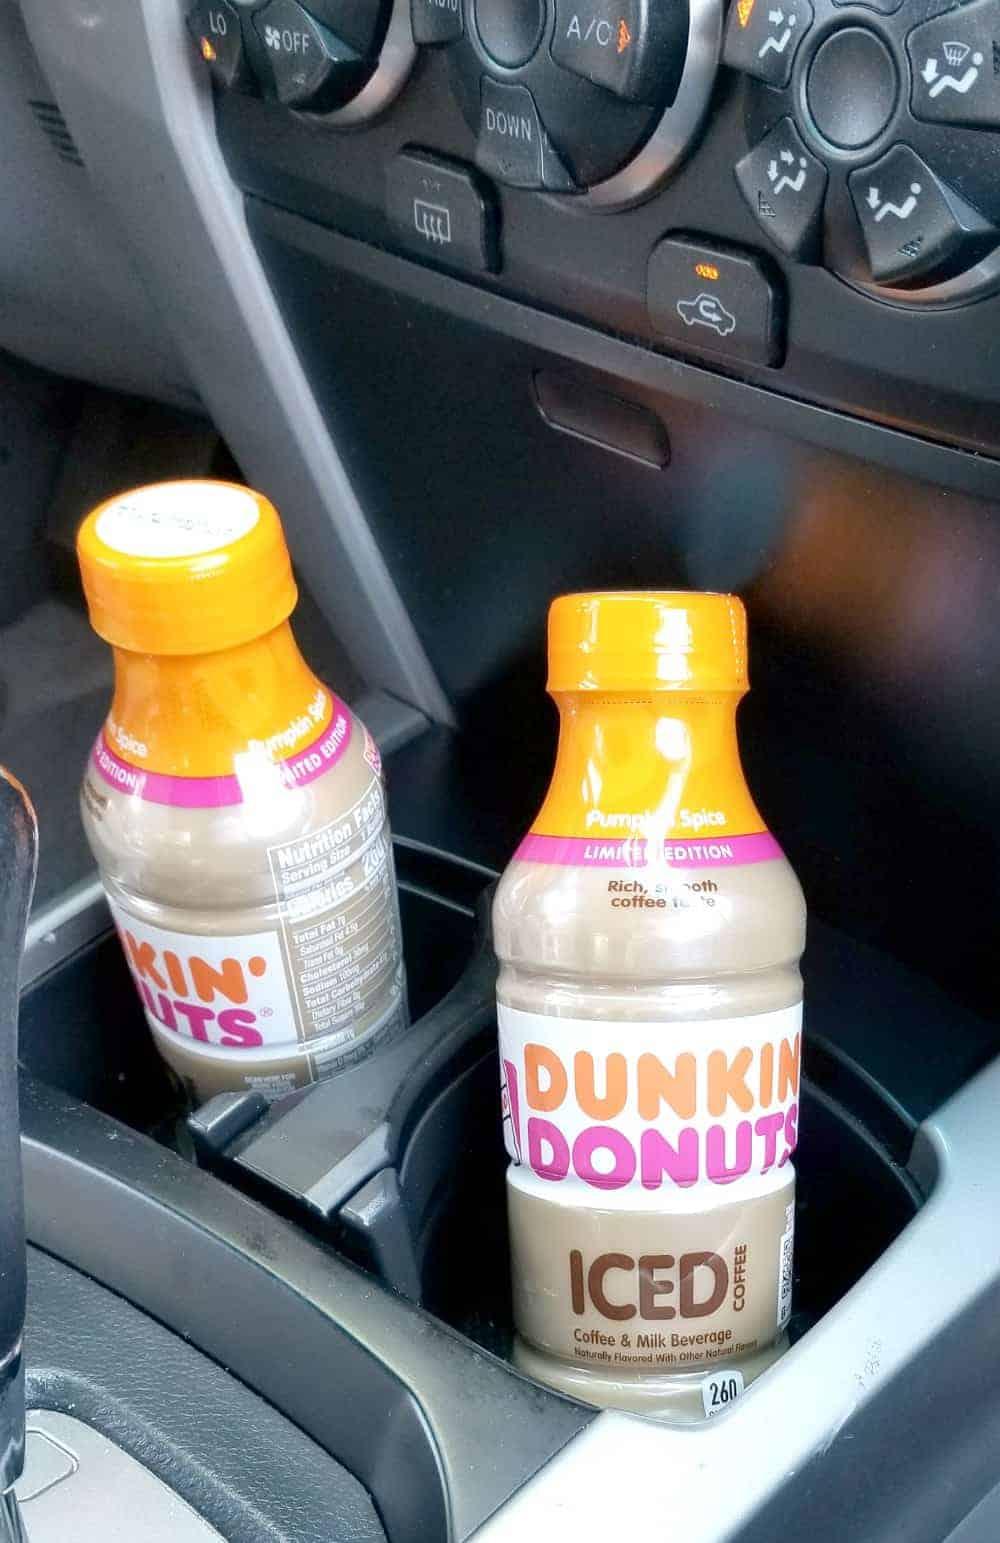 Last Minute Road Trip Essentials |Dunkin' Donuts Bottled Iced Coffee Pumpkin Spice